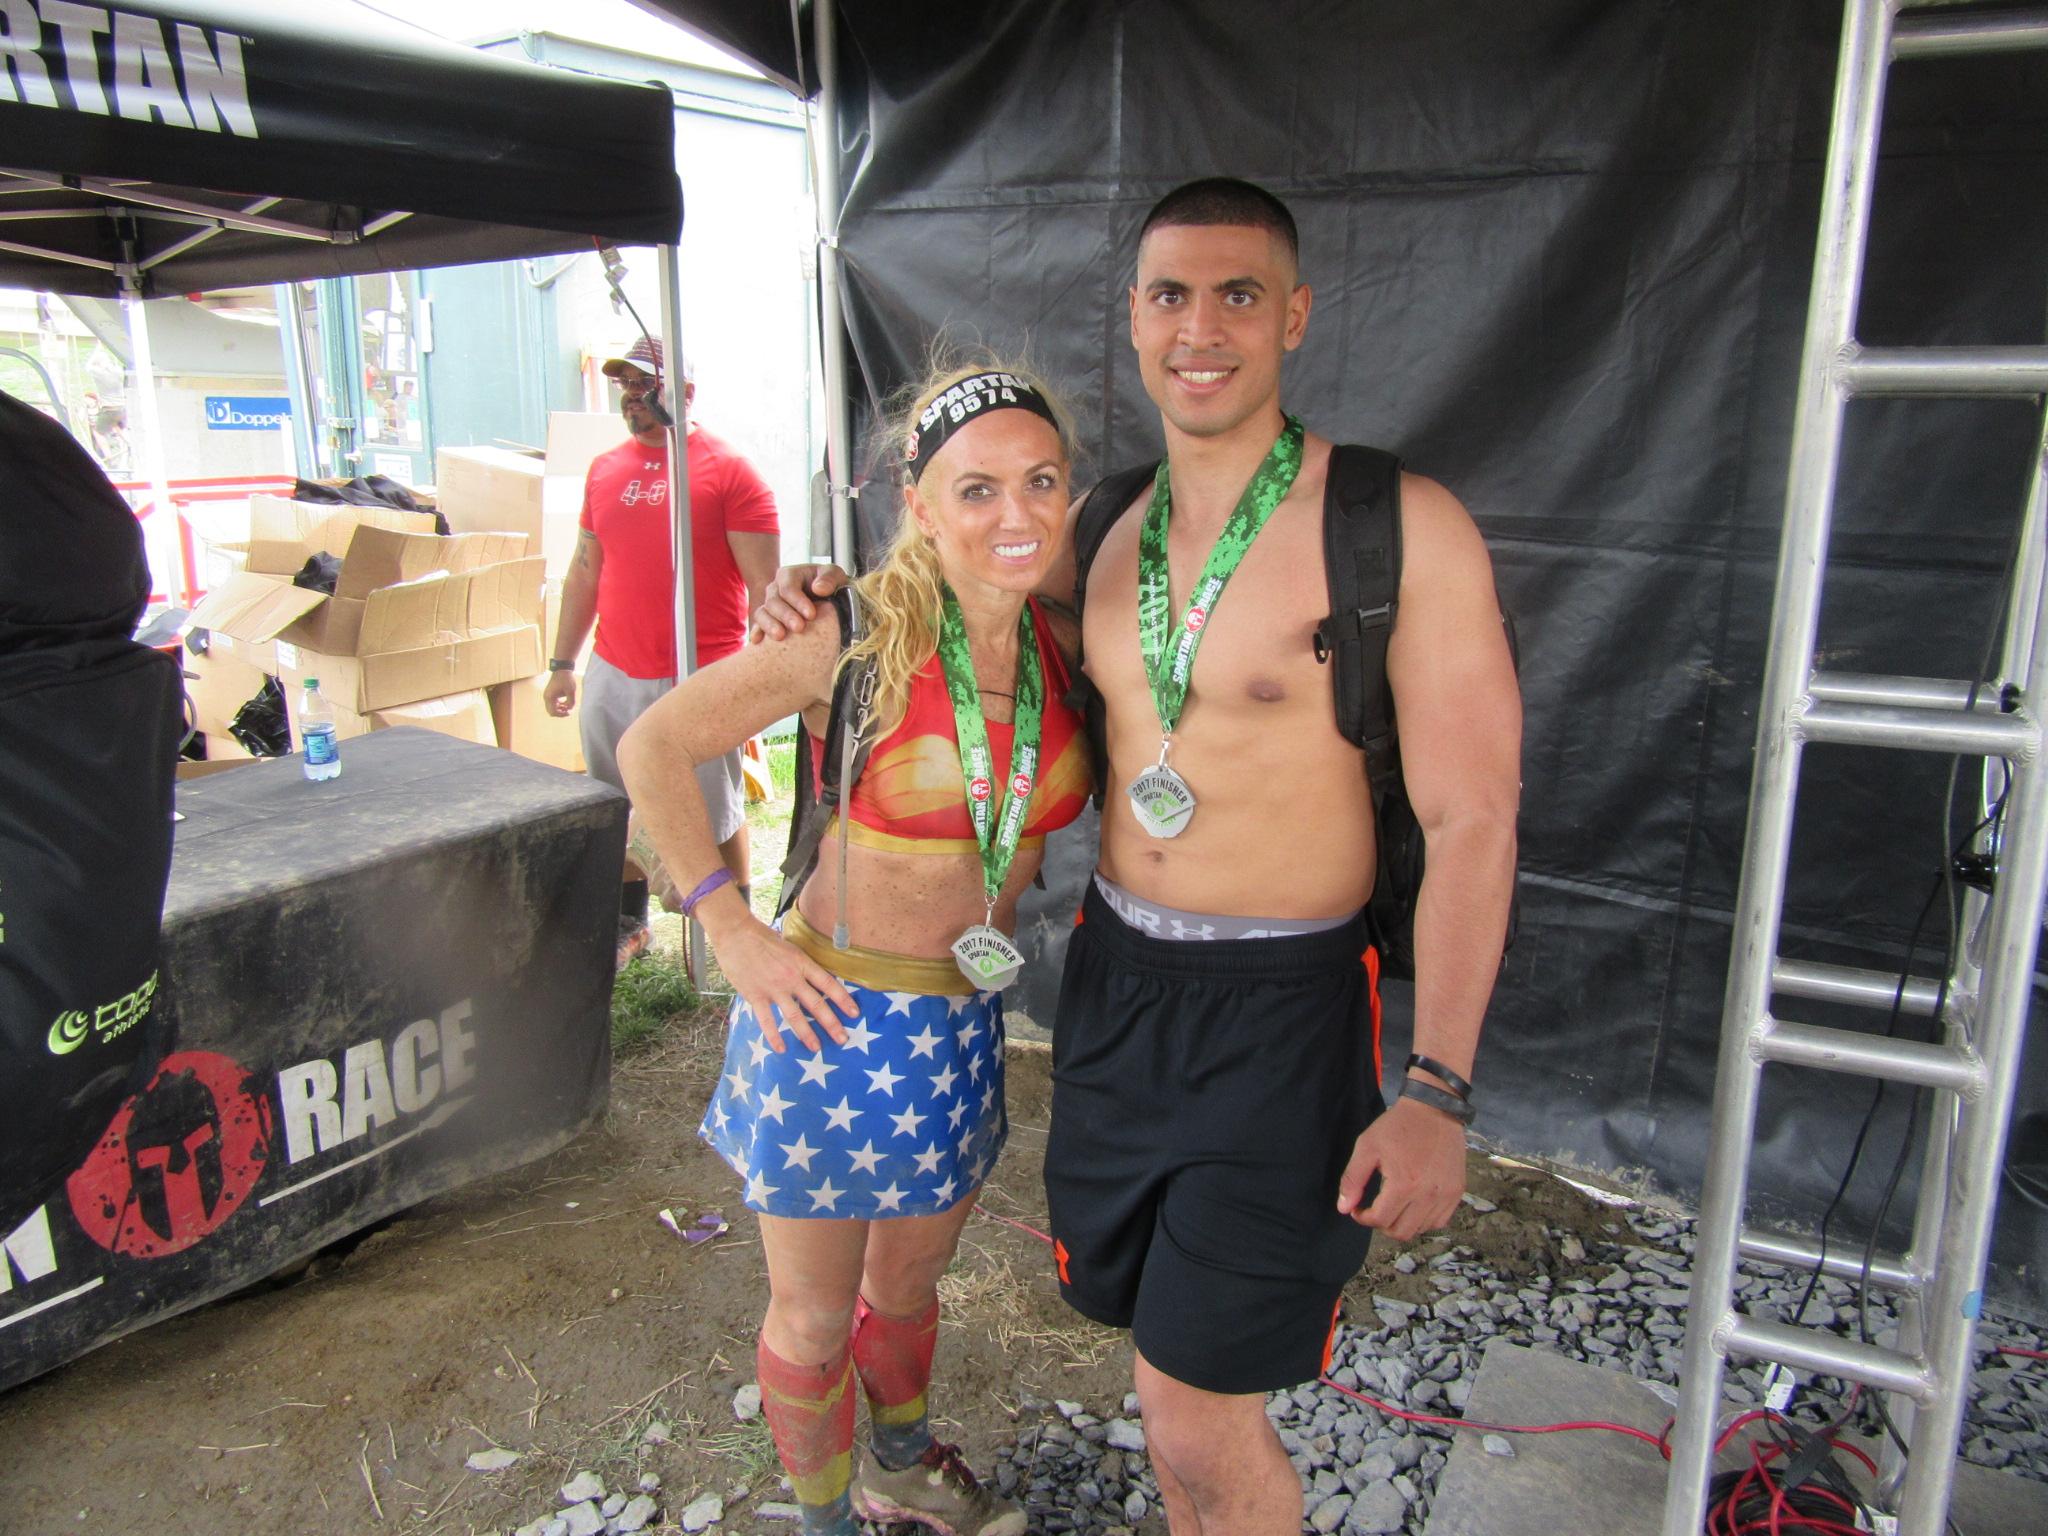 Myself and Daily Burn Spartan star, fitness model and trainer Madeline Dolente. (Instagram.com/madelinedolente)